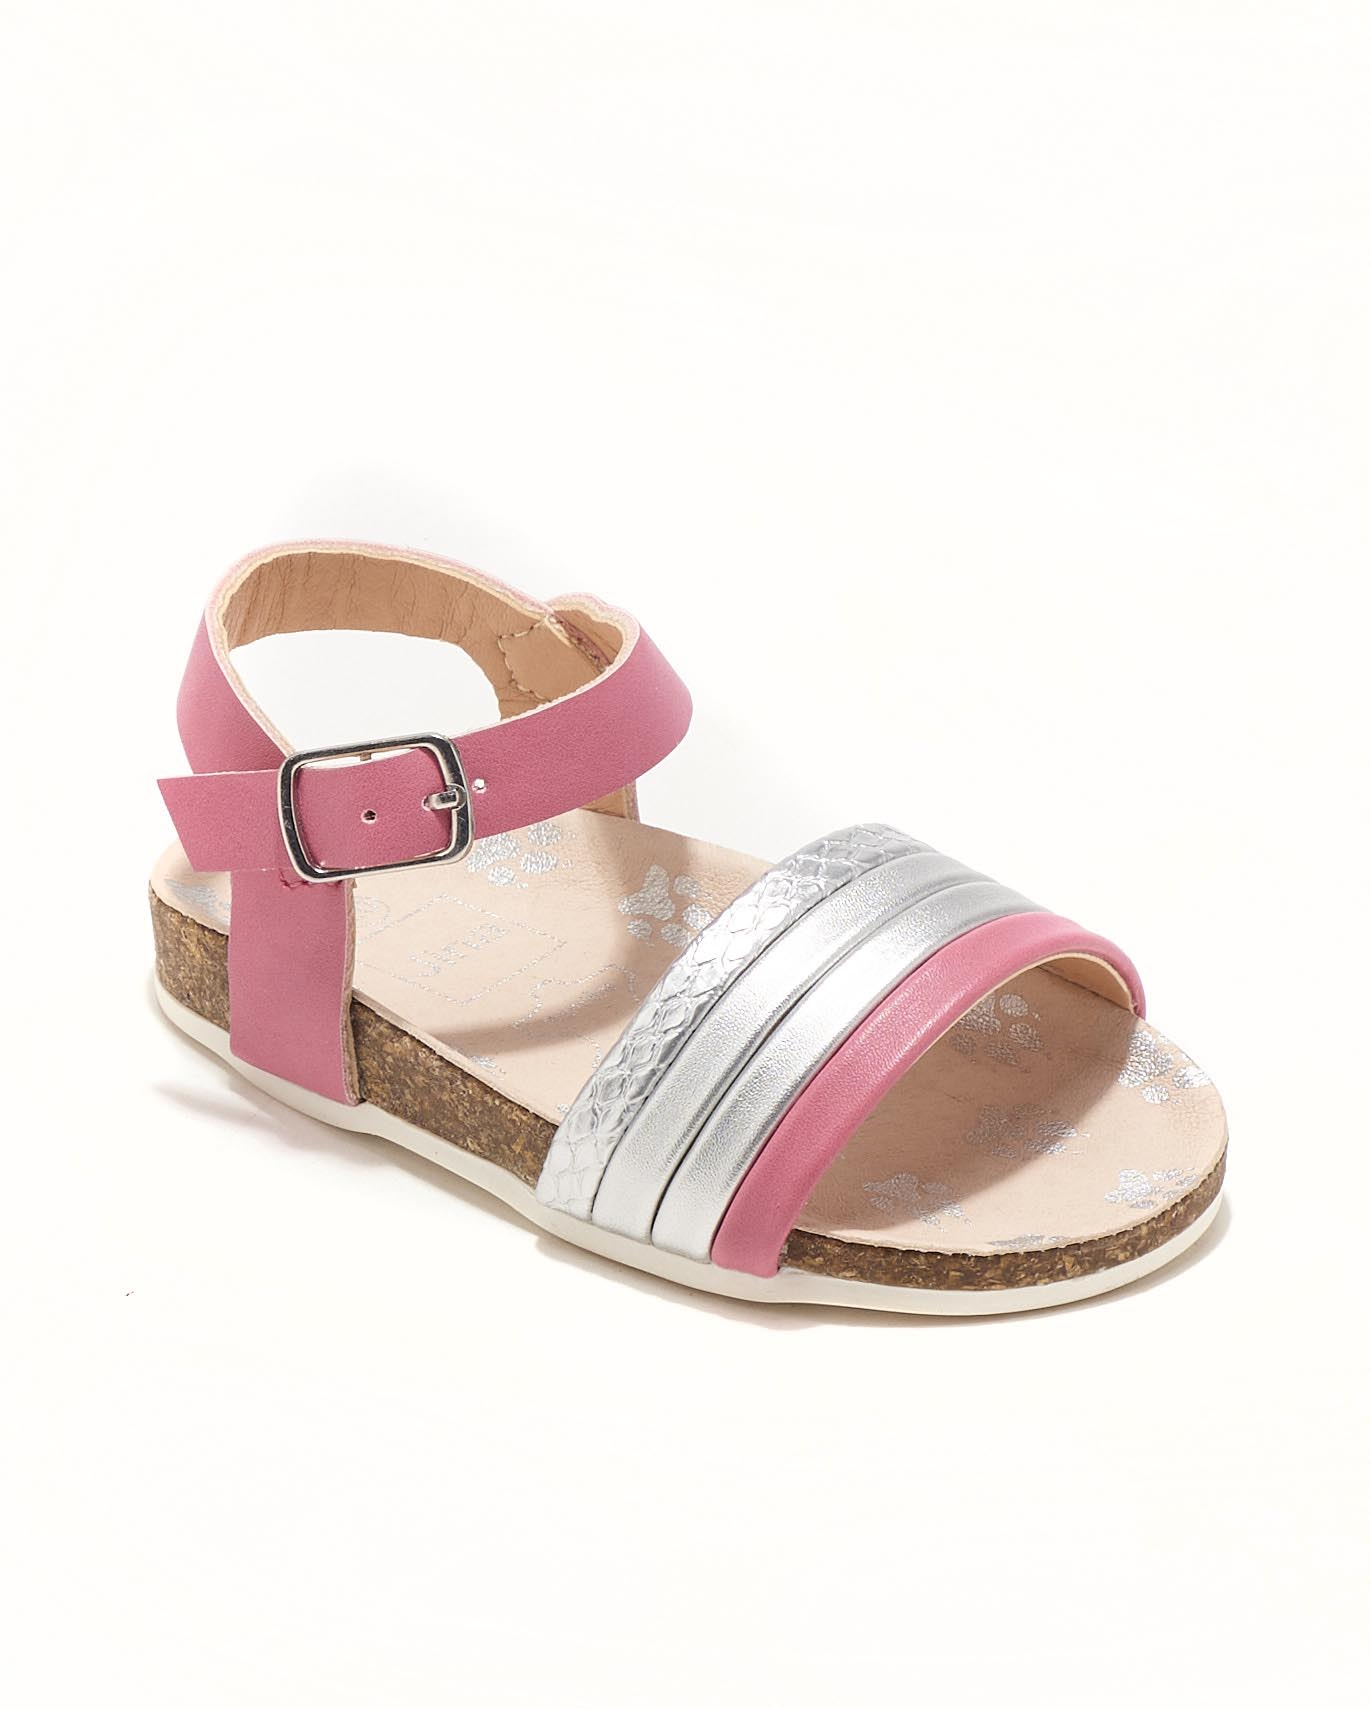 Sandales Bébé Fille - Sandale Ouverte Fuschia Jina - Ydxhx30ai-2 Bis